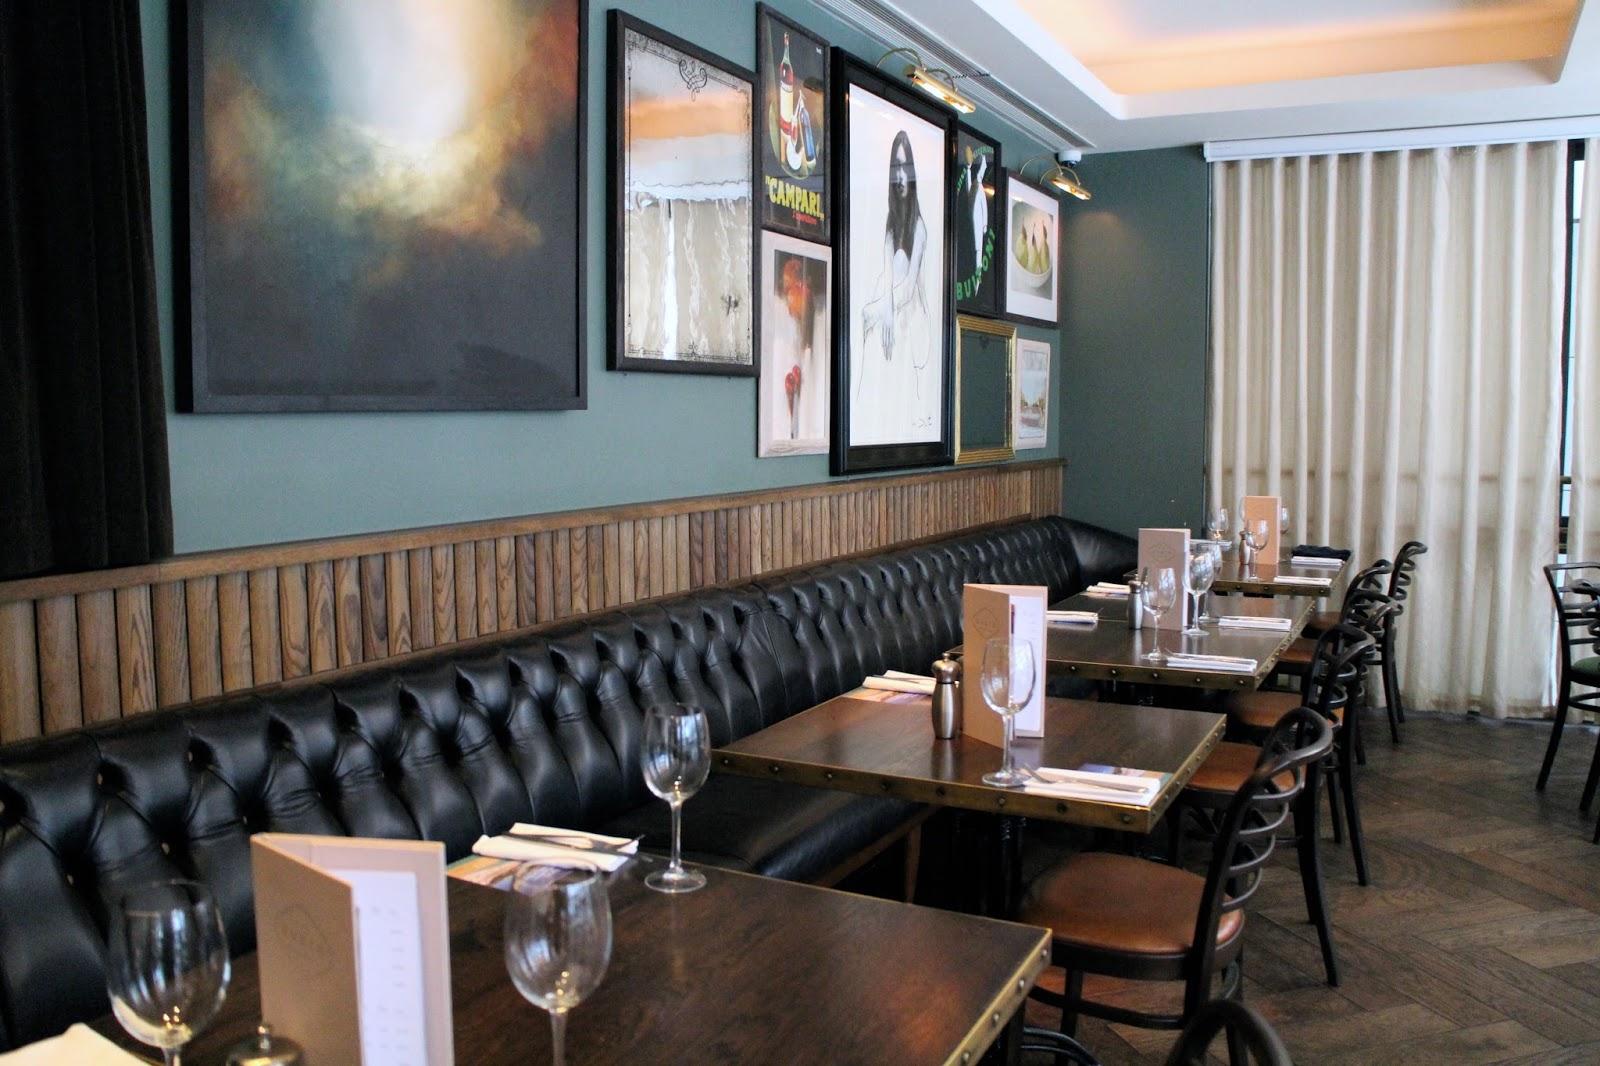 Gorgeous frame decor at Gusto Restaurants